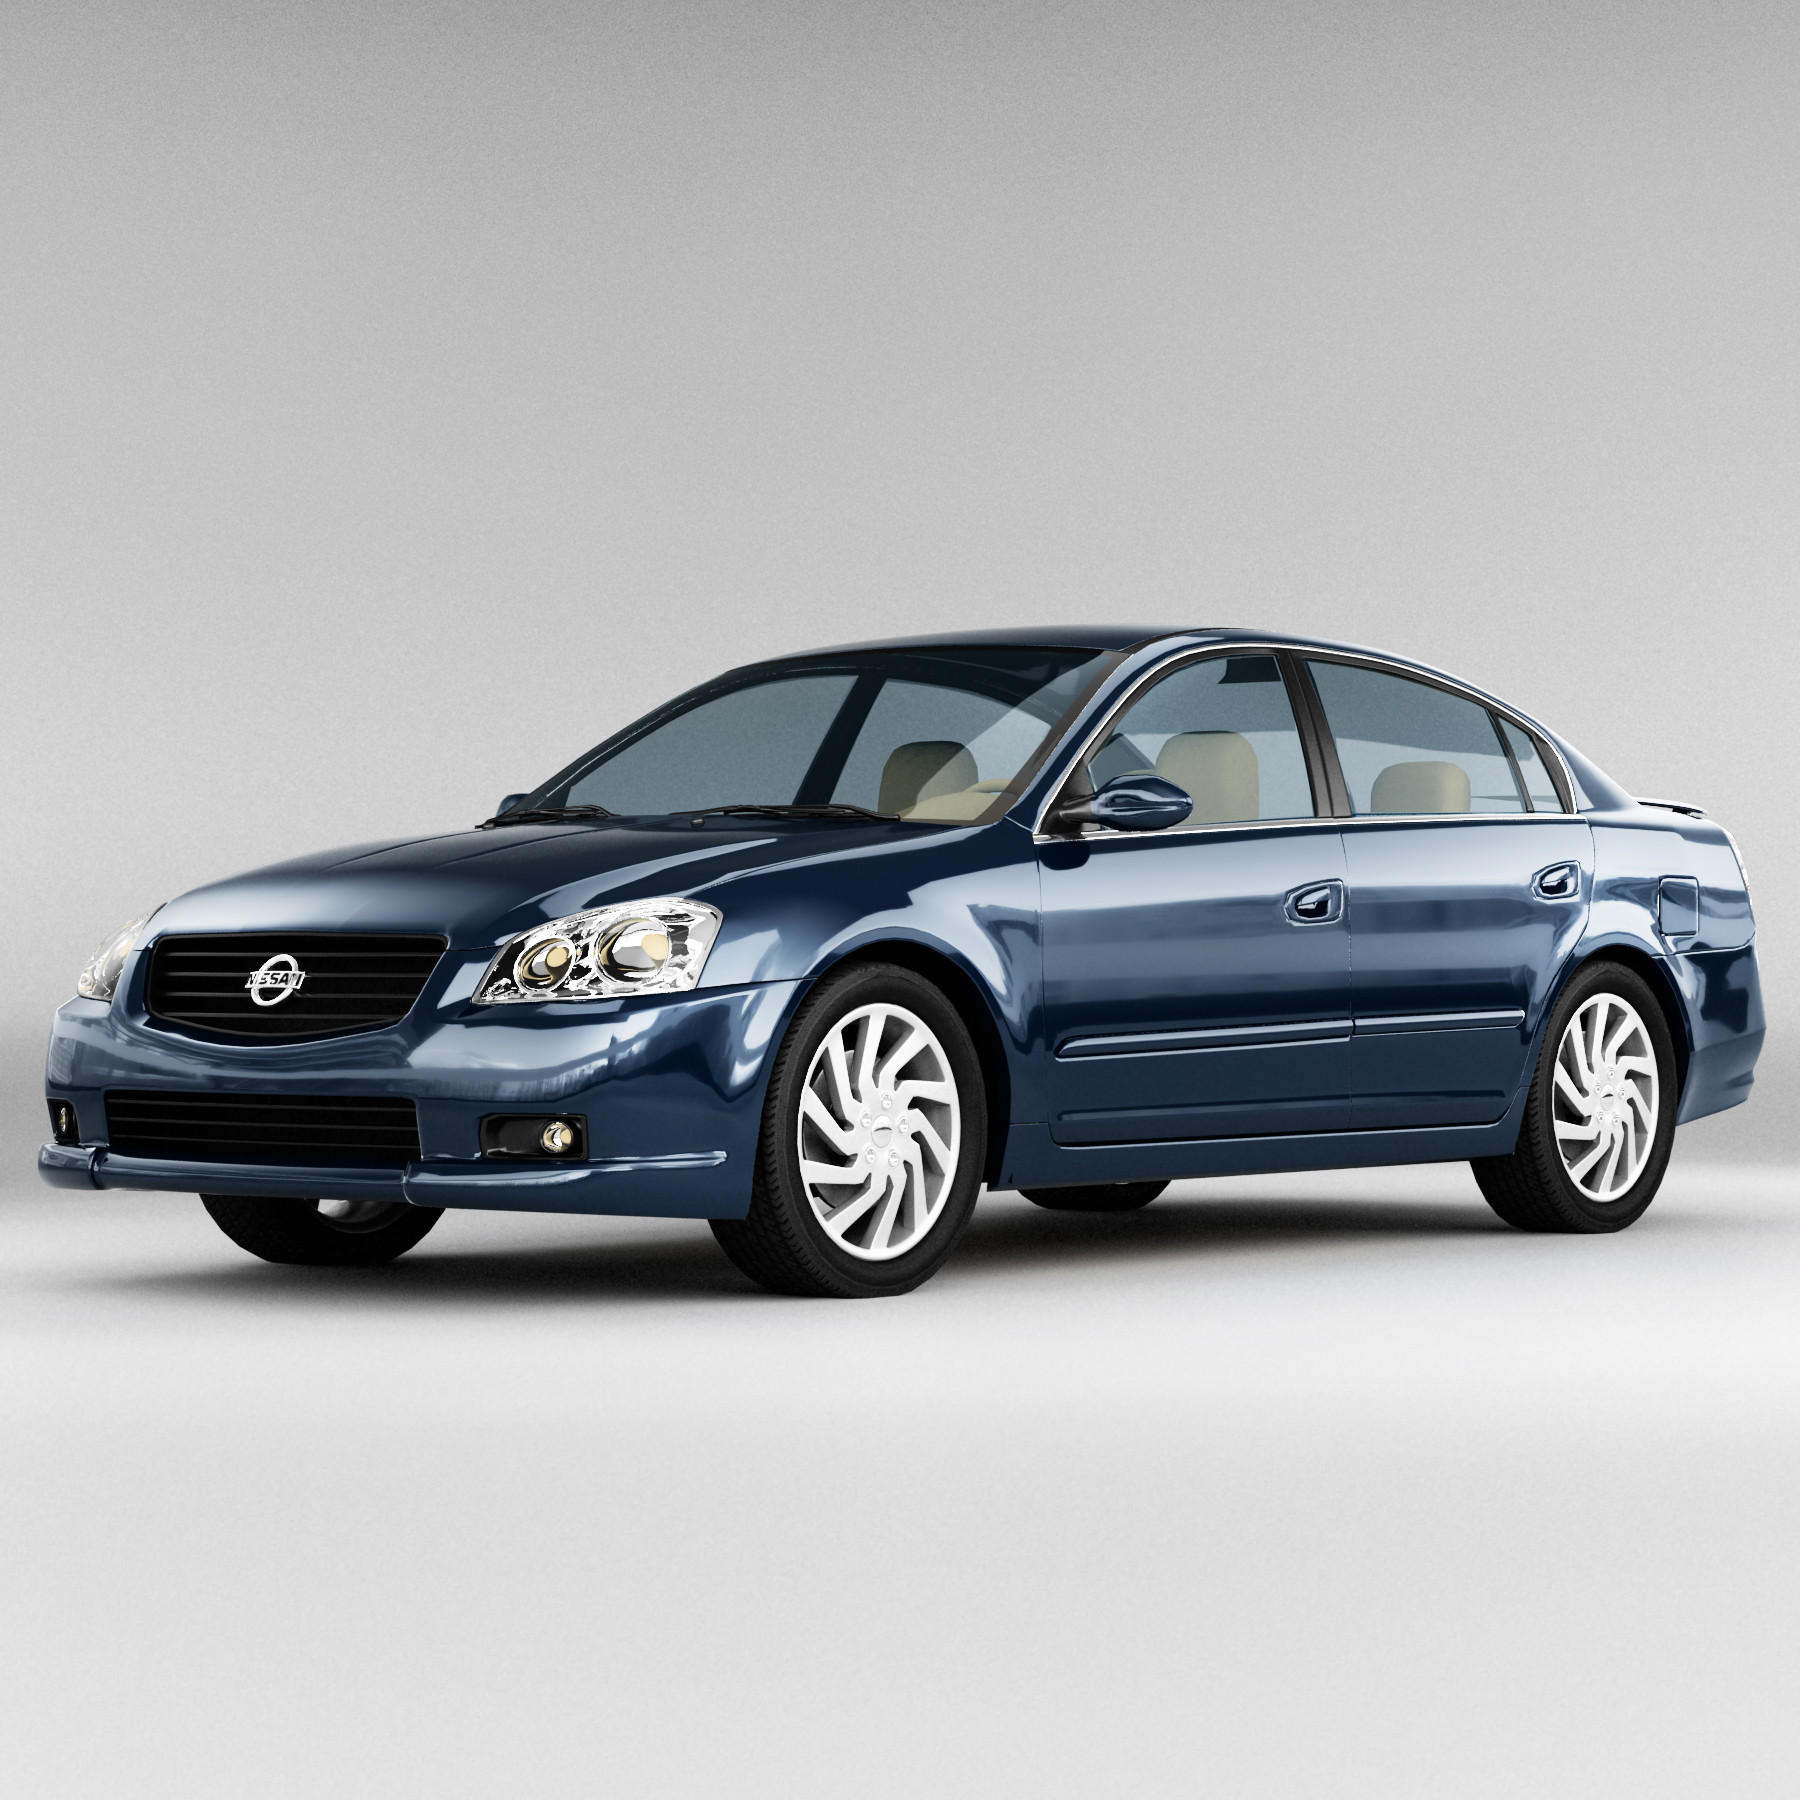 01 VC021 Nissan Altima_View010000.jpg